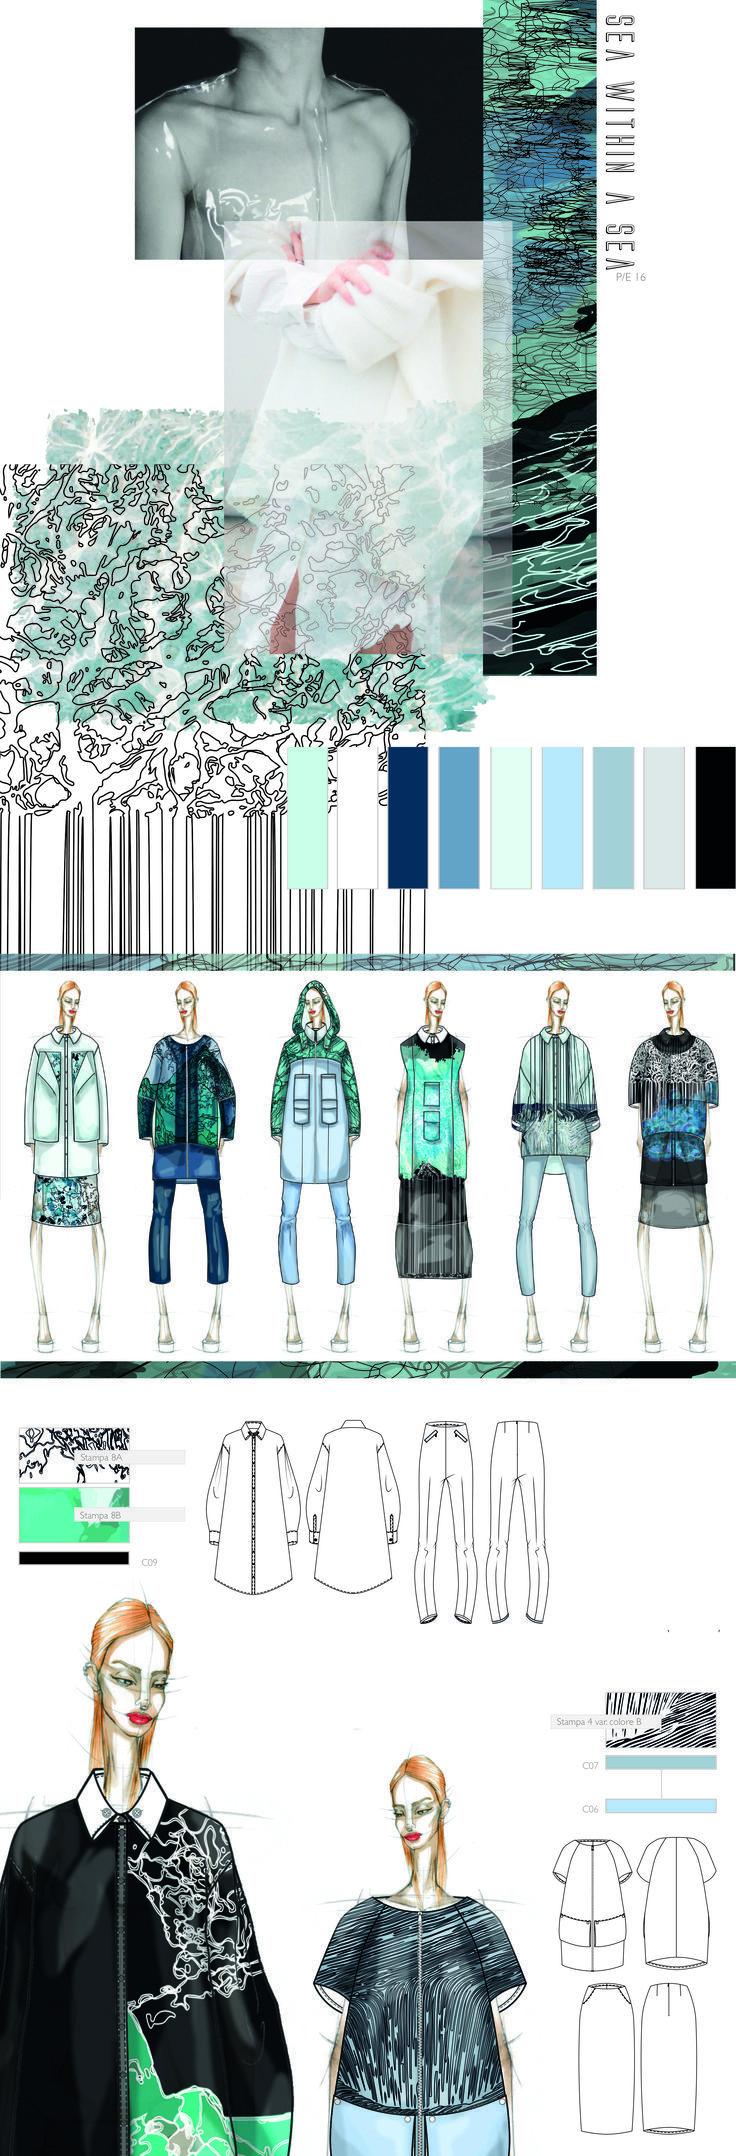 Fashion Sketchbook - fashion illustrations; fashion design development; fashion portfolio // Valeria Pulici: